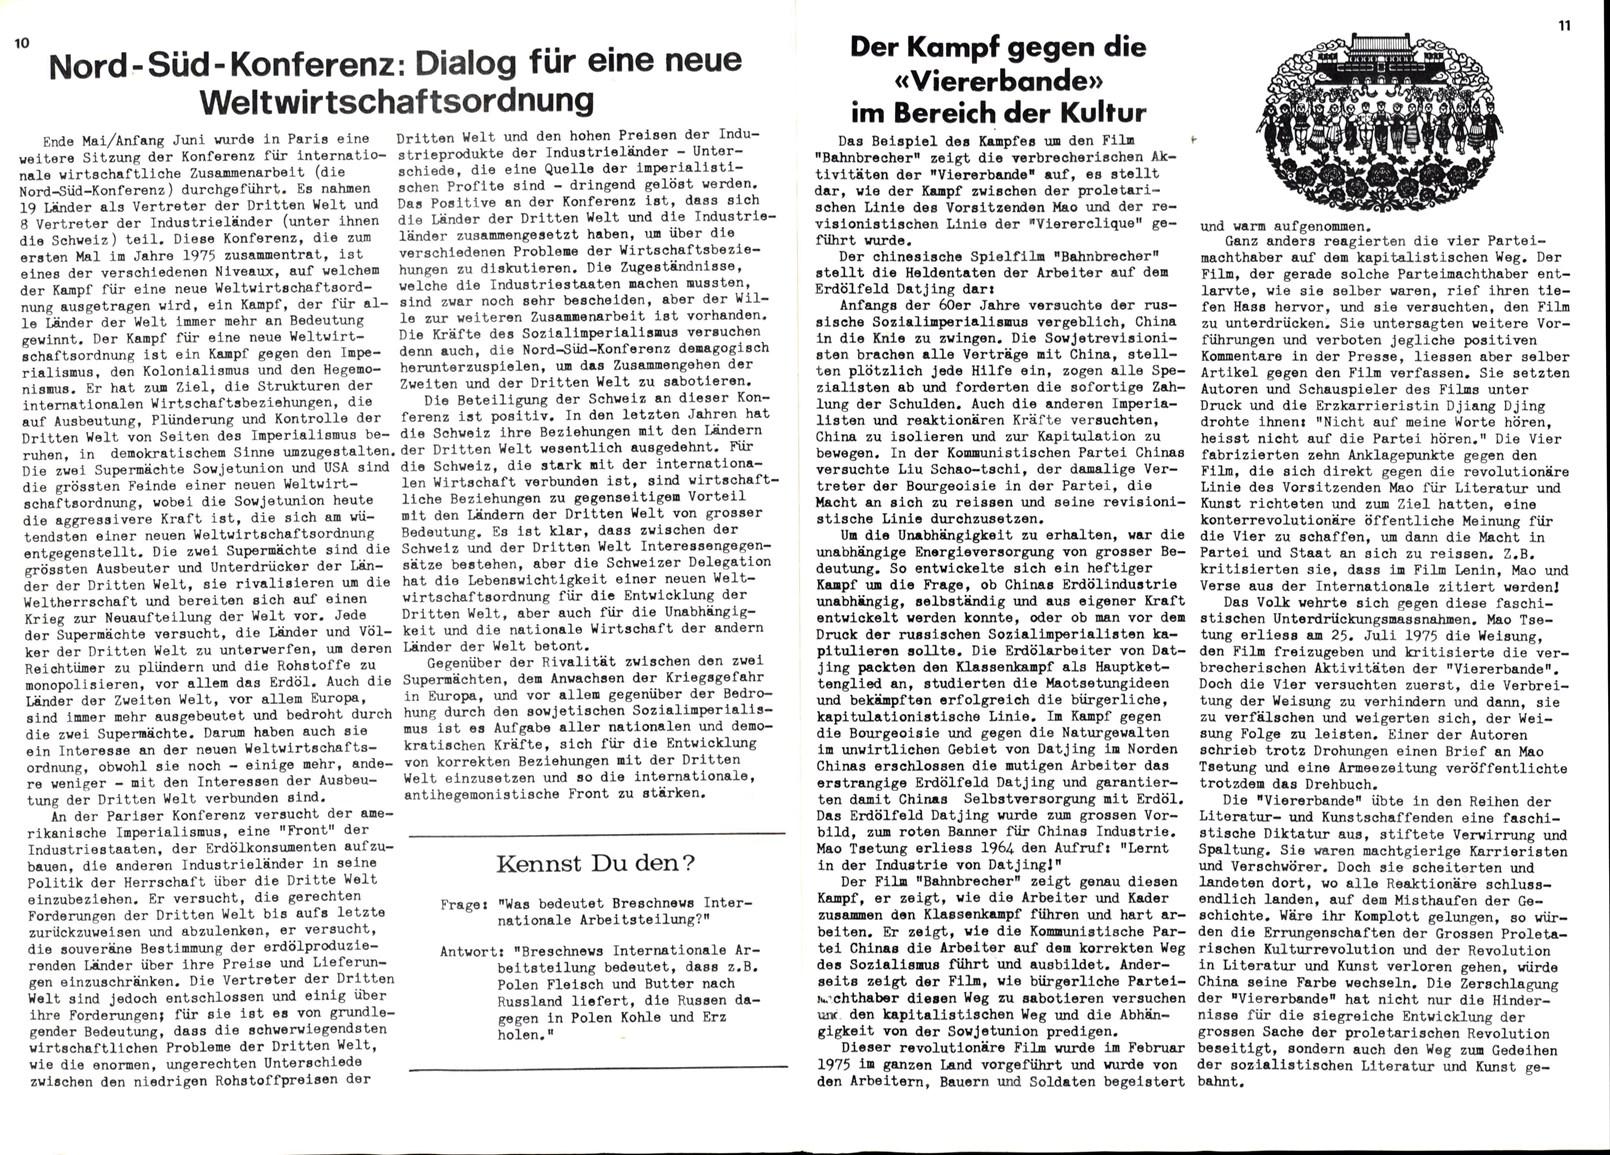 Schweiz_KPSML_Oktober_19770700_112_006